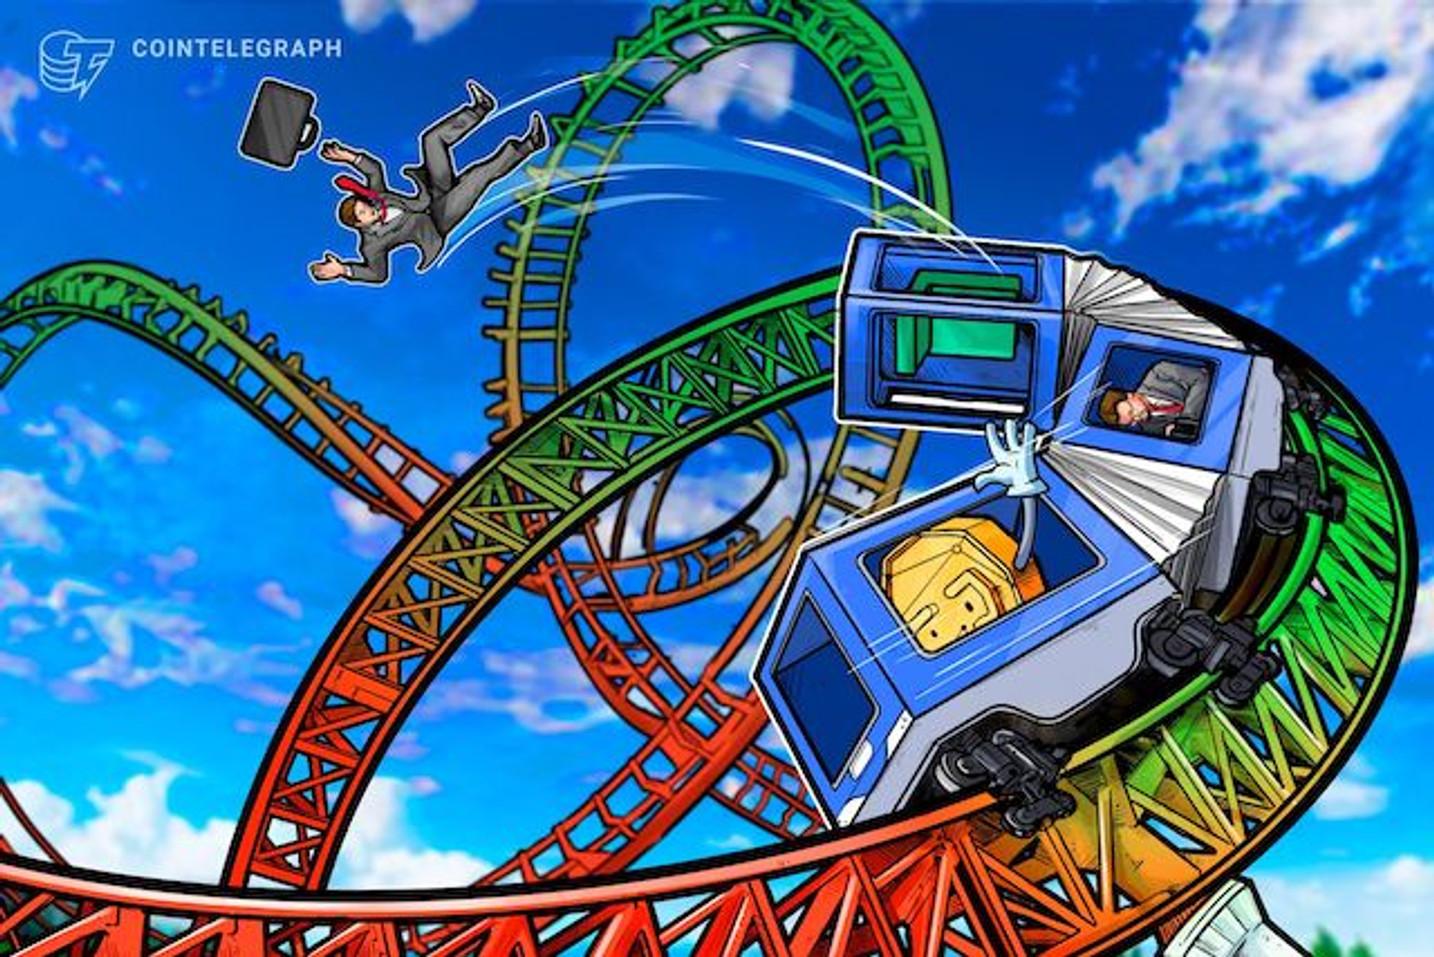 BTC相場は下落、ビットコインキャッシュ下落の影響か|仮想通貨相場市況(3月26日)